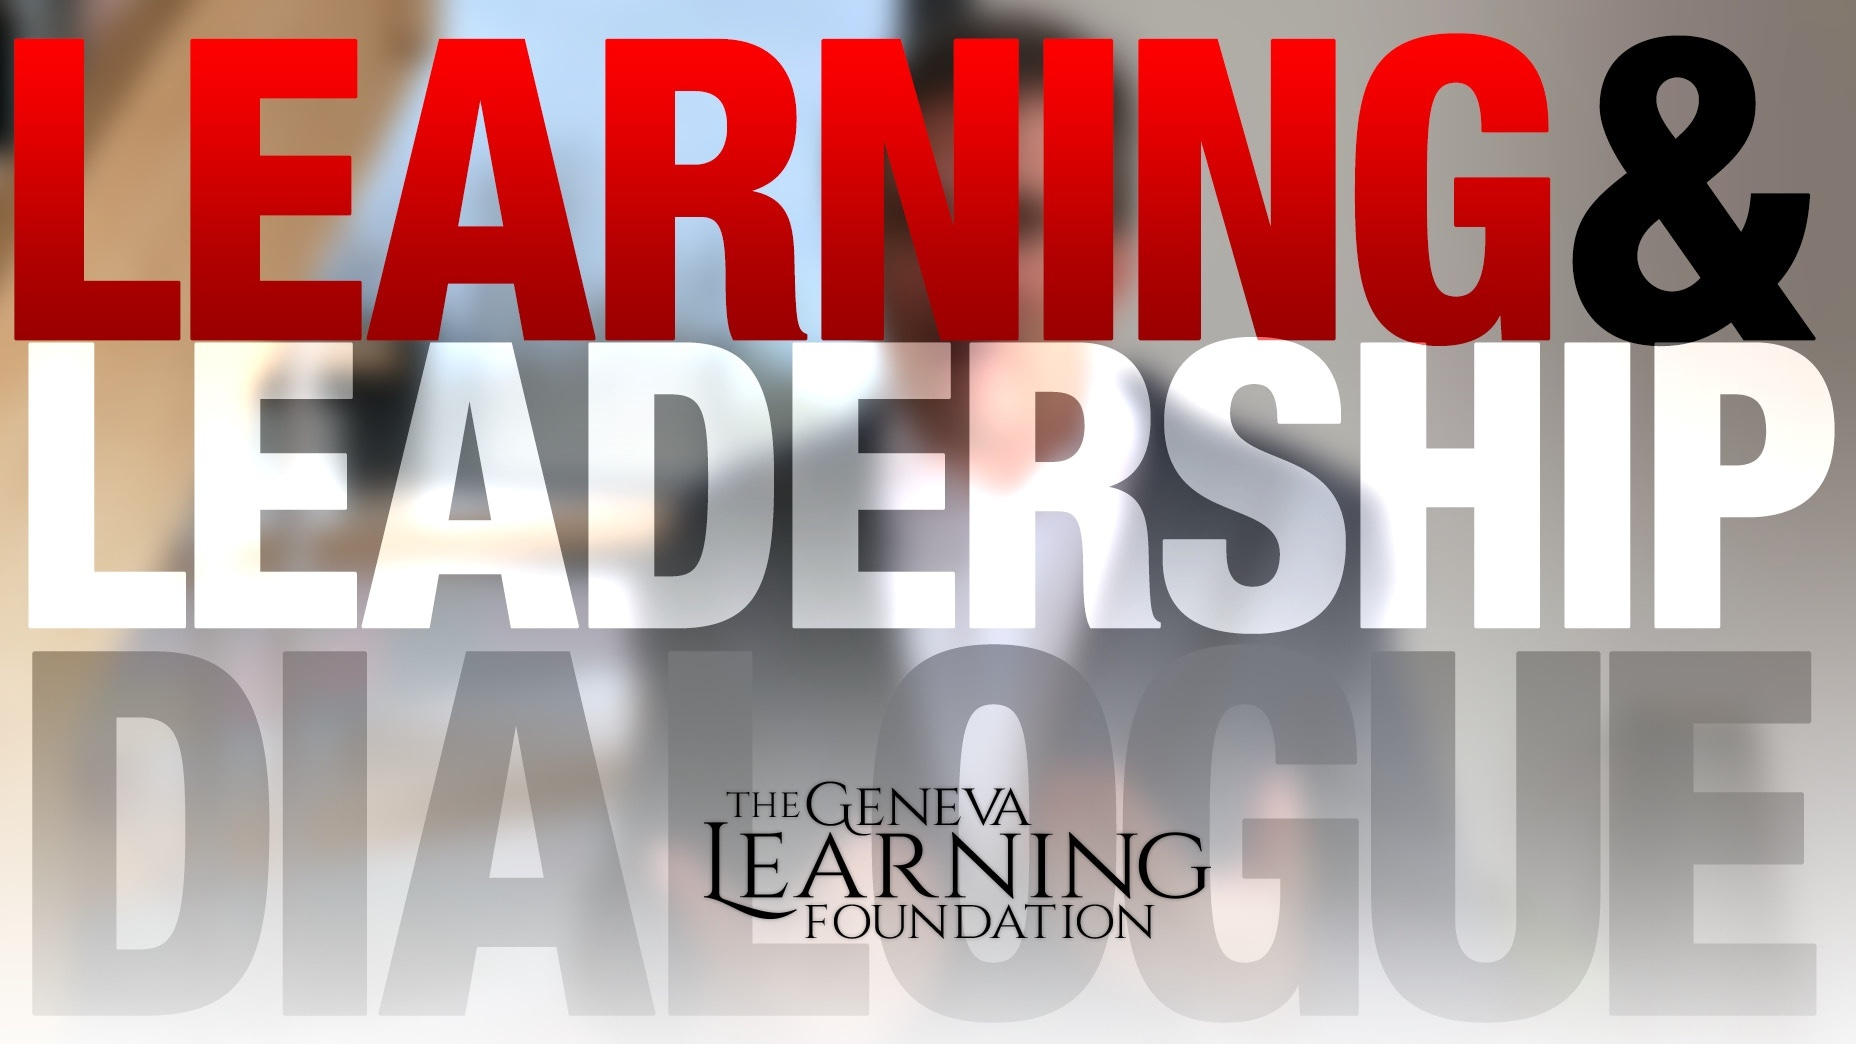 TGLF Learning & Leadership Dialogue